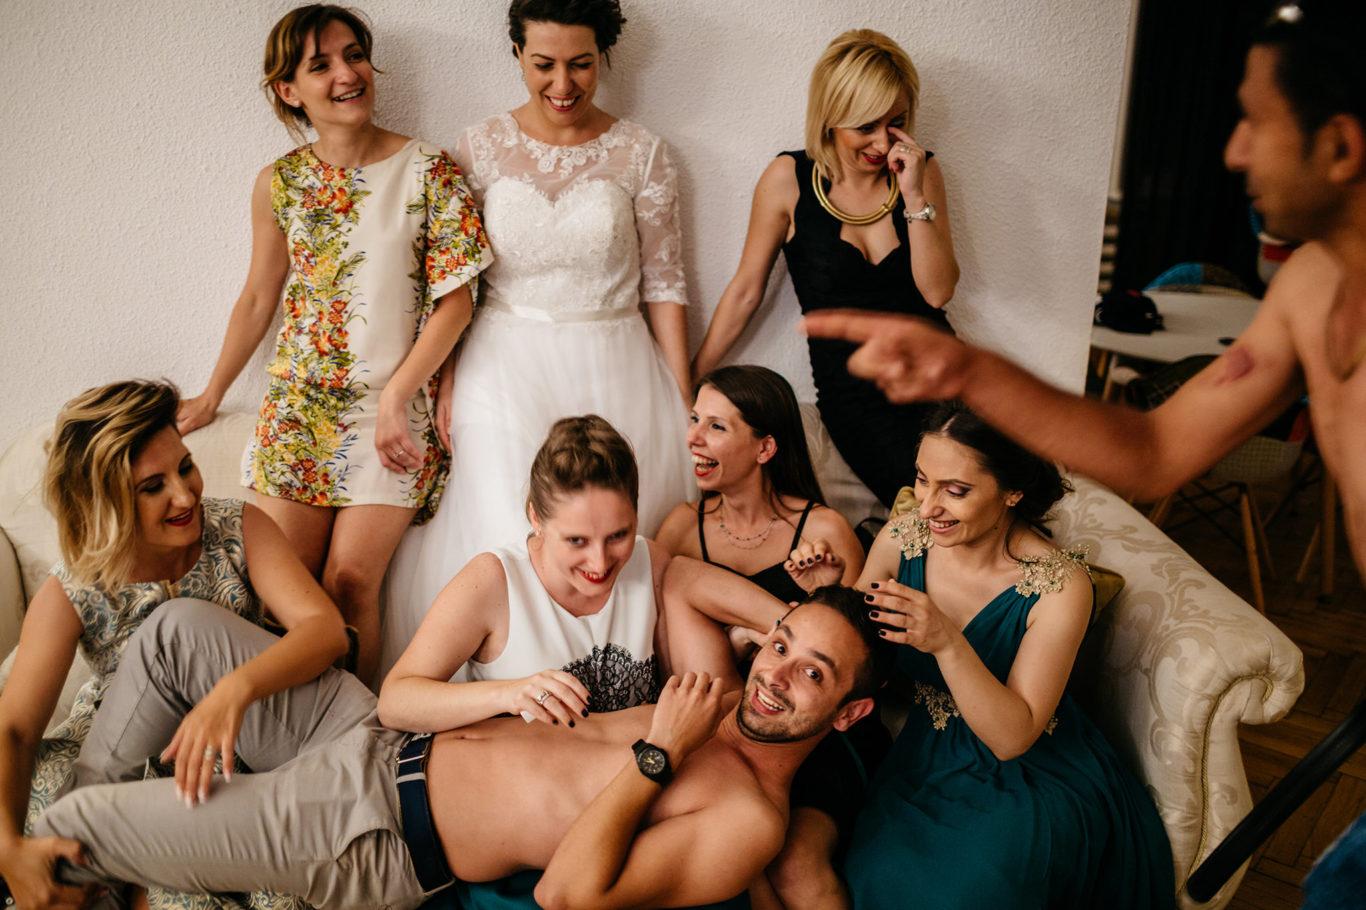 0723-fotografie-nunta-bucuresti-anca-george-fotograf-ciprian-dumitrescu-dcf_6176